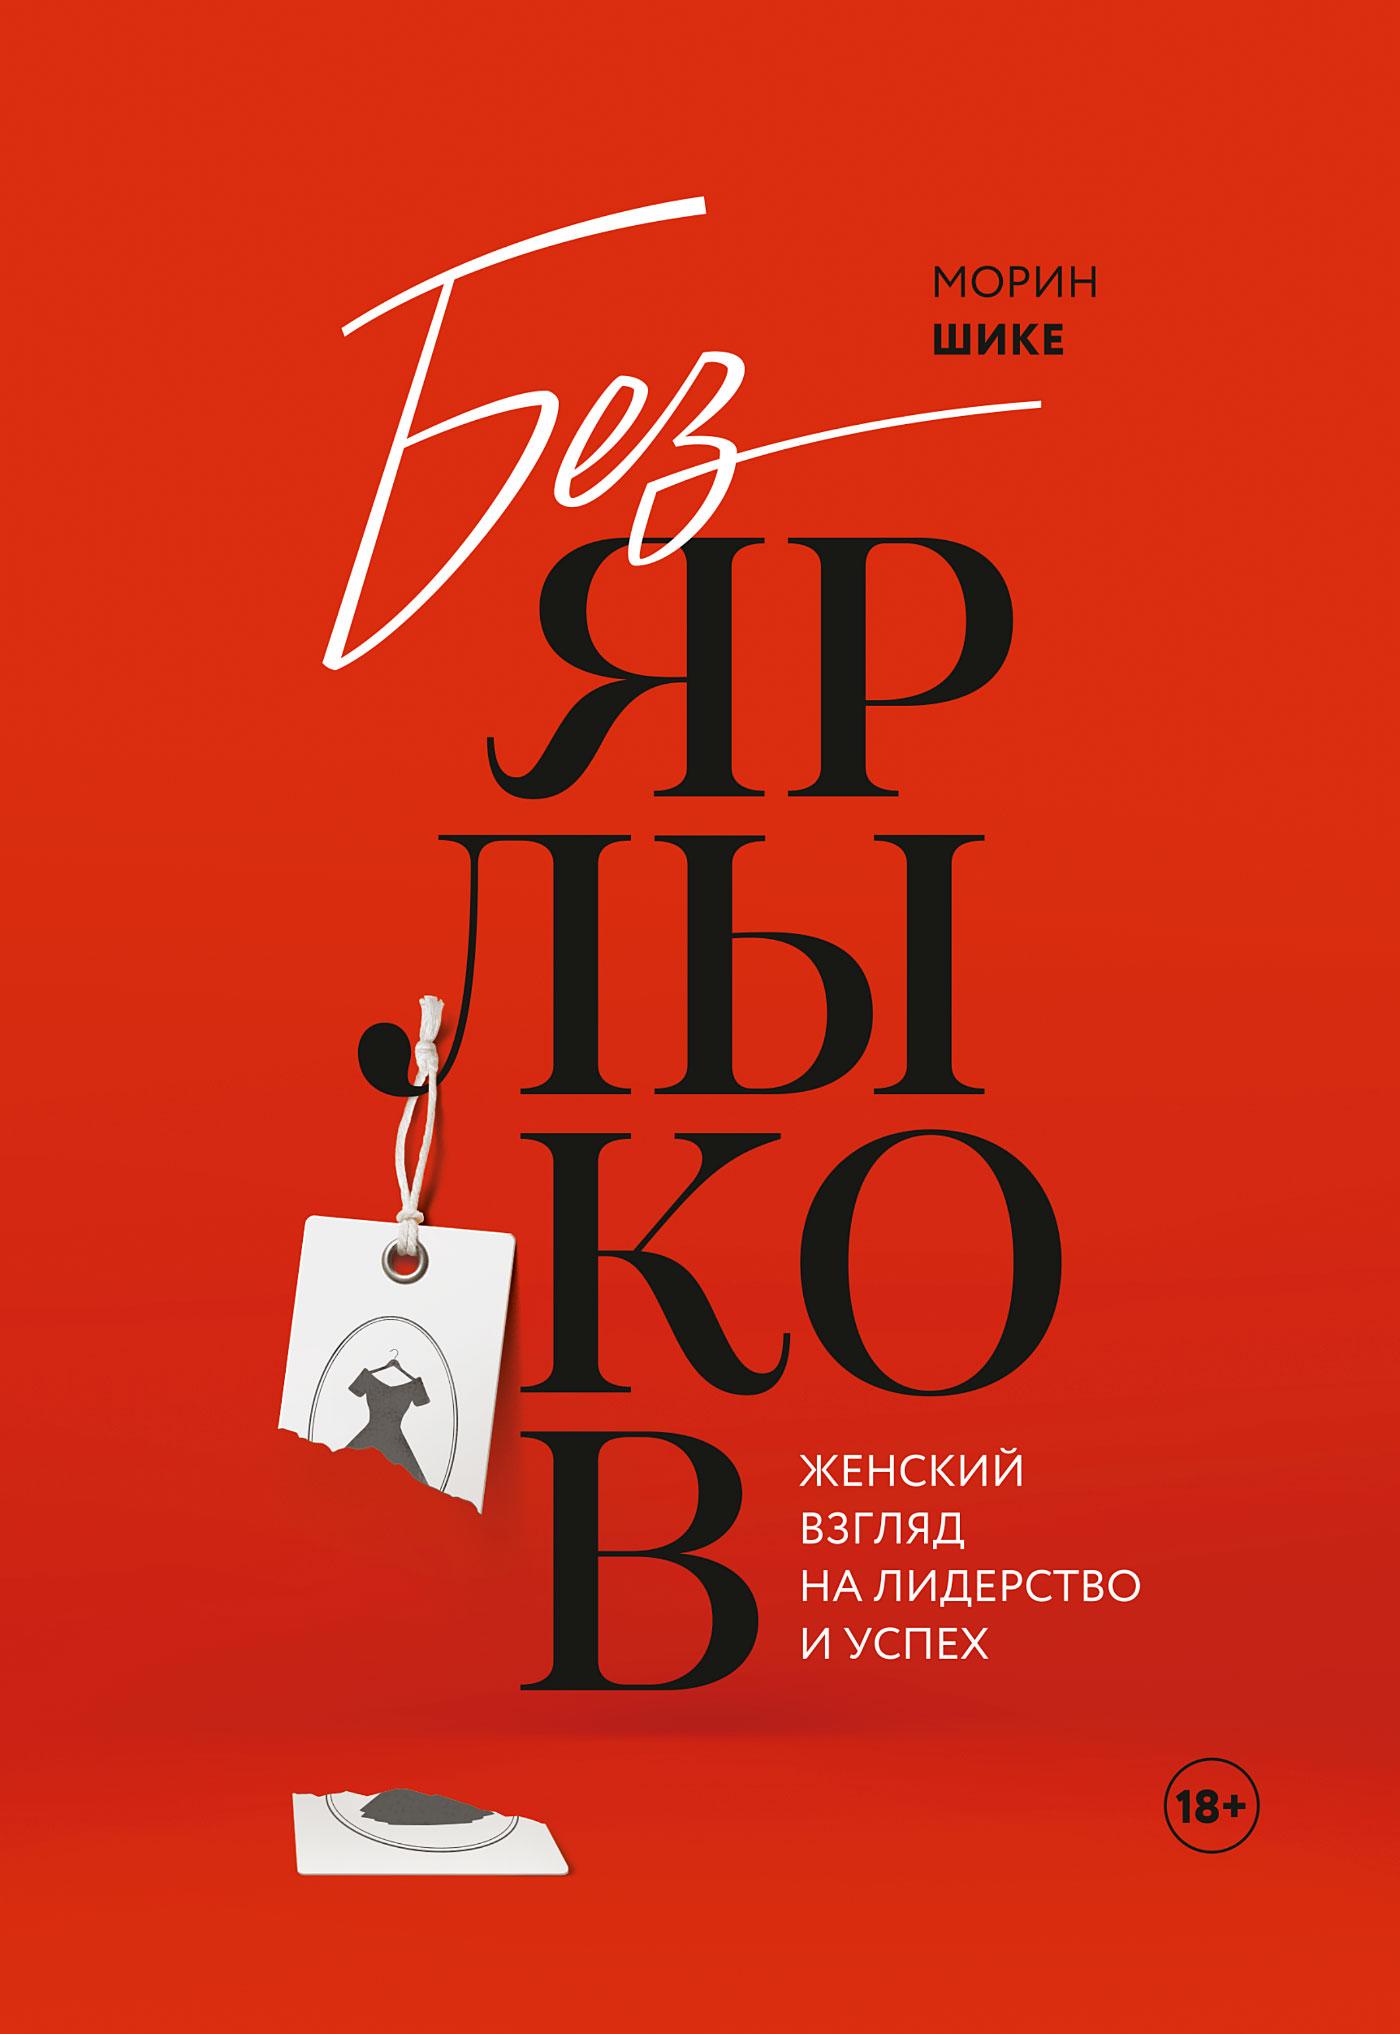 Обложка книги. Автор - Морин Шике